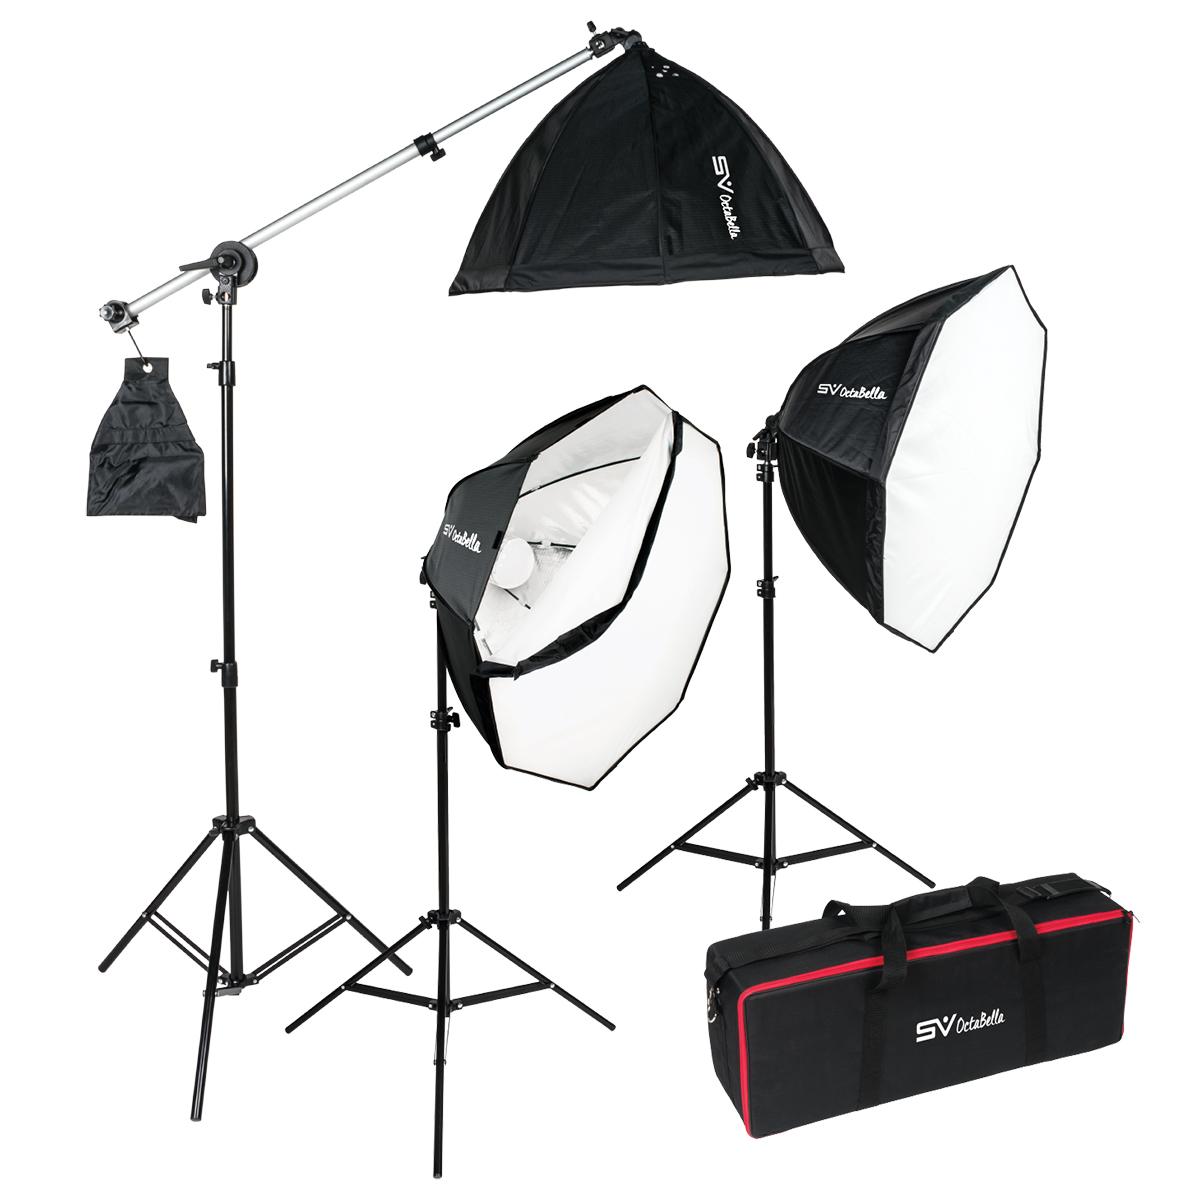 octabella 1500 3 light 1500w led daylight softbox lighting kit with boom arm